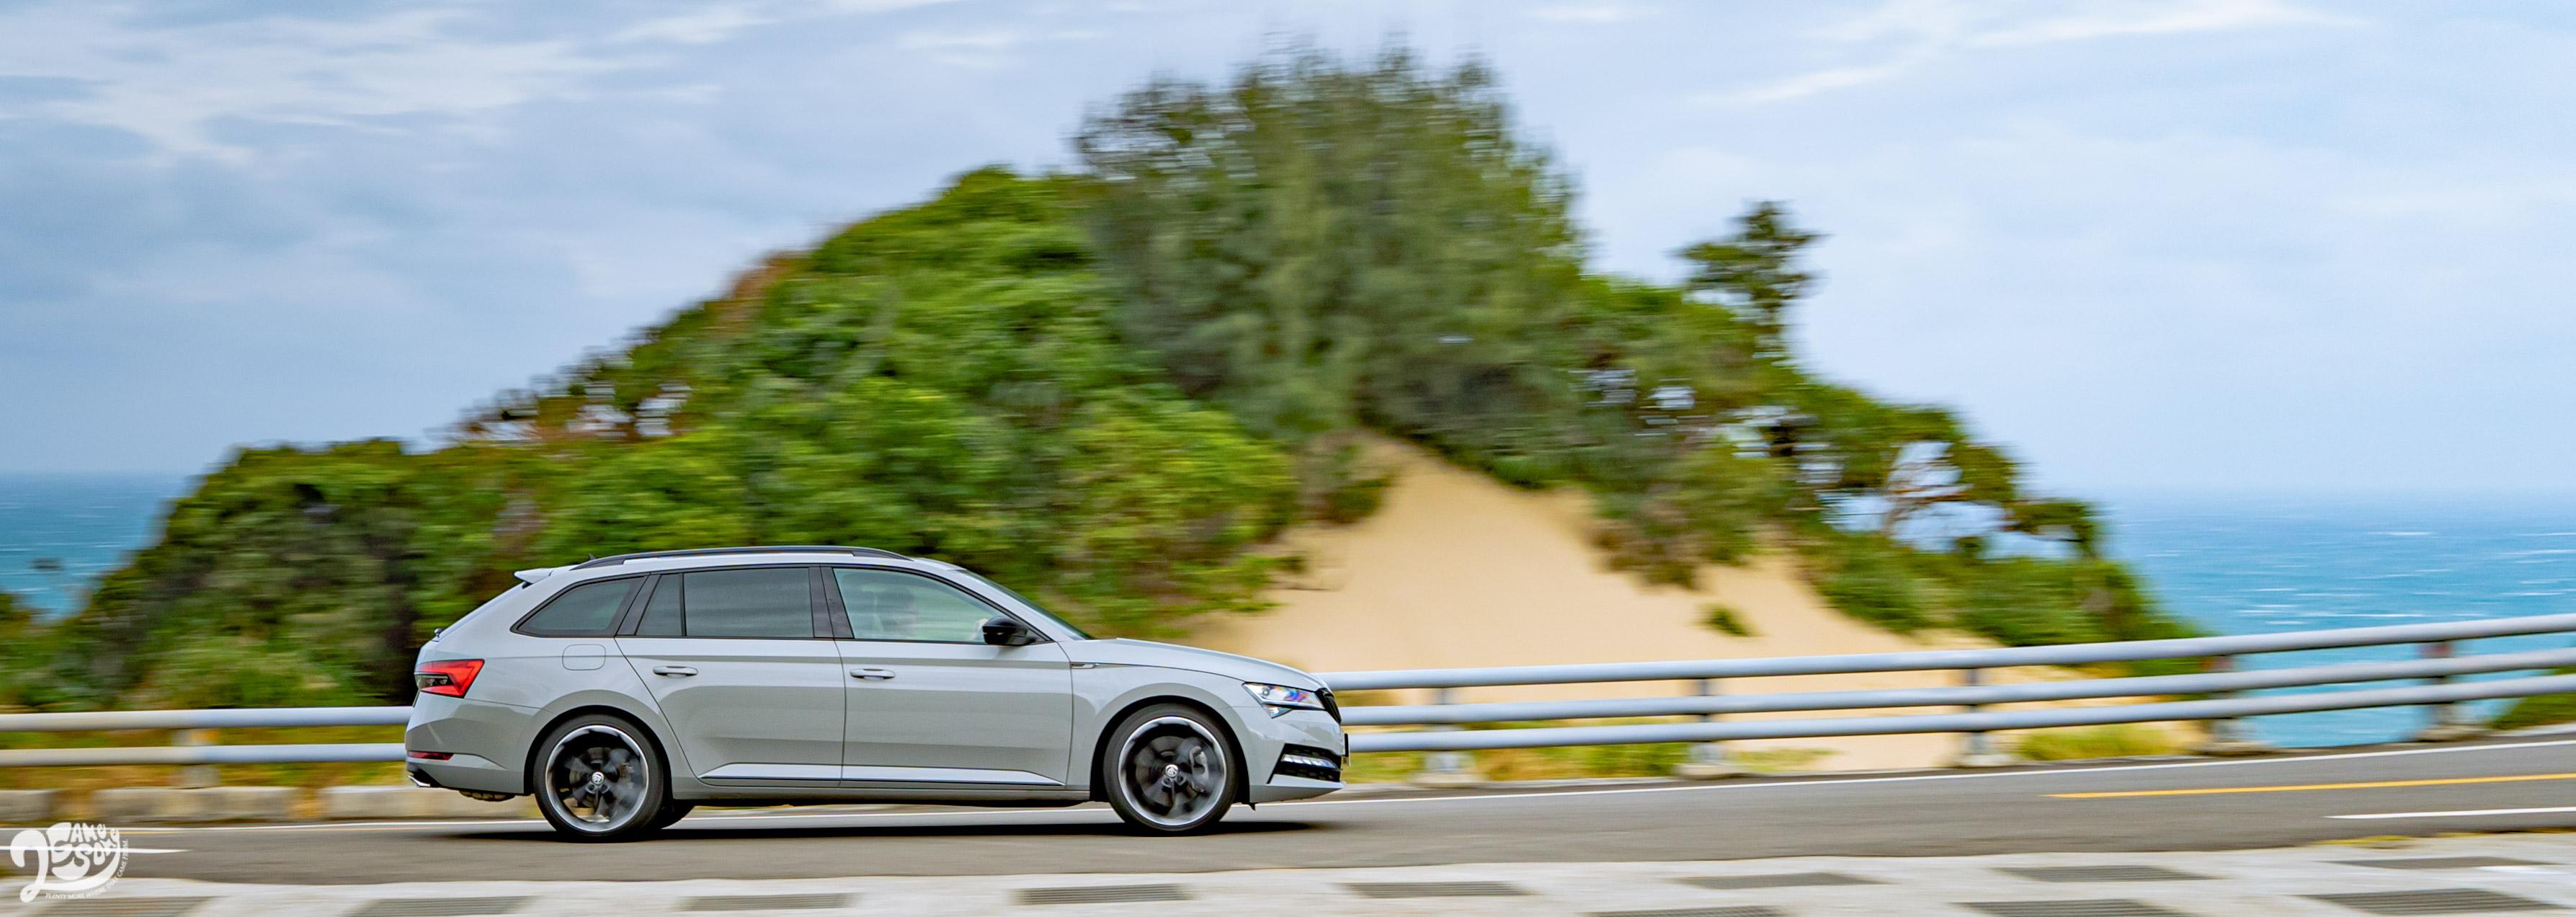 Škoda Superb Combi SportPlus 4x4 原價 172.9 萬,年底前優惠價 169.9 萬。